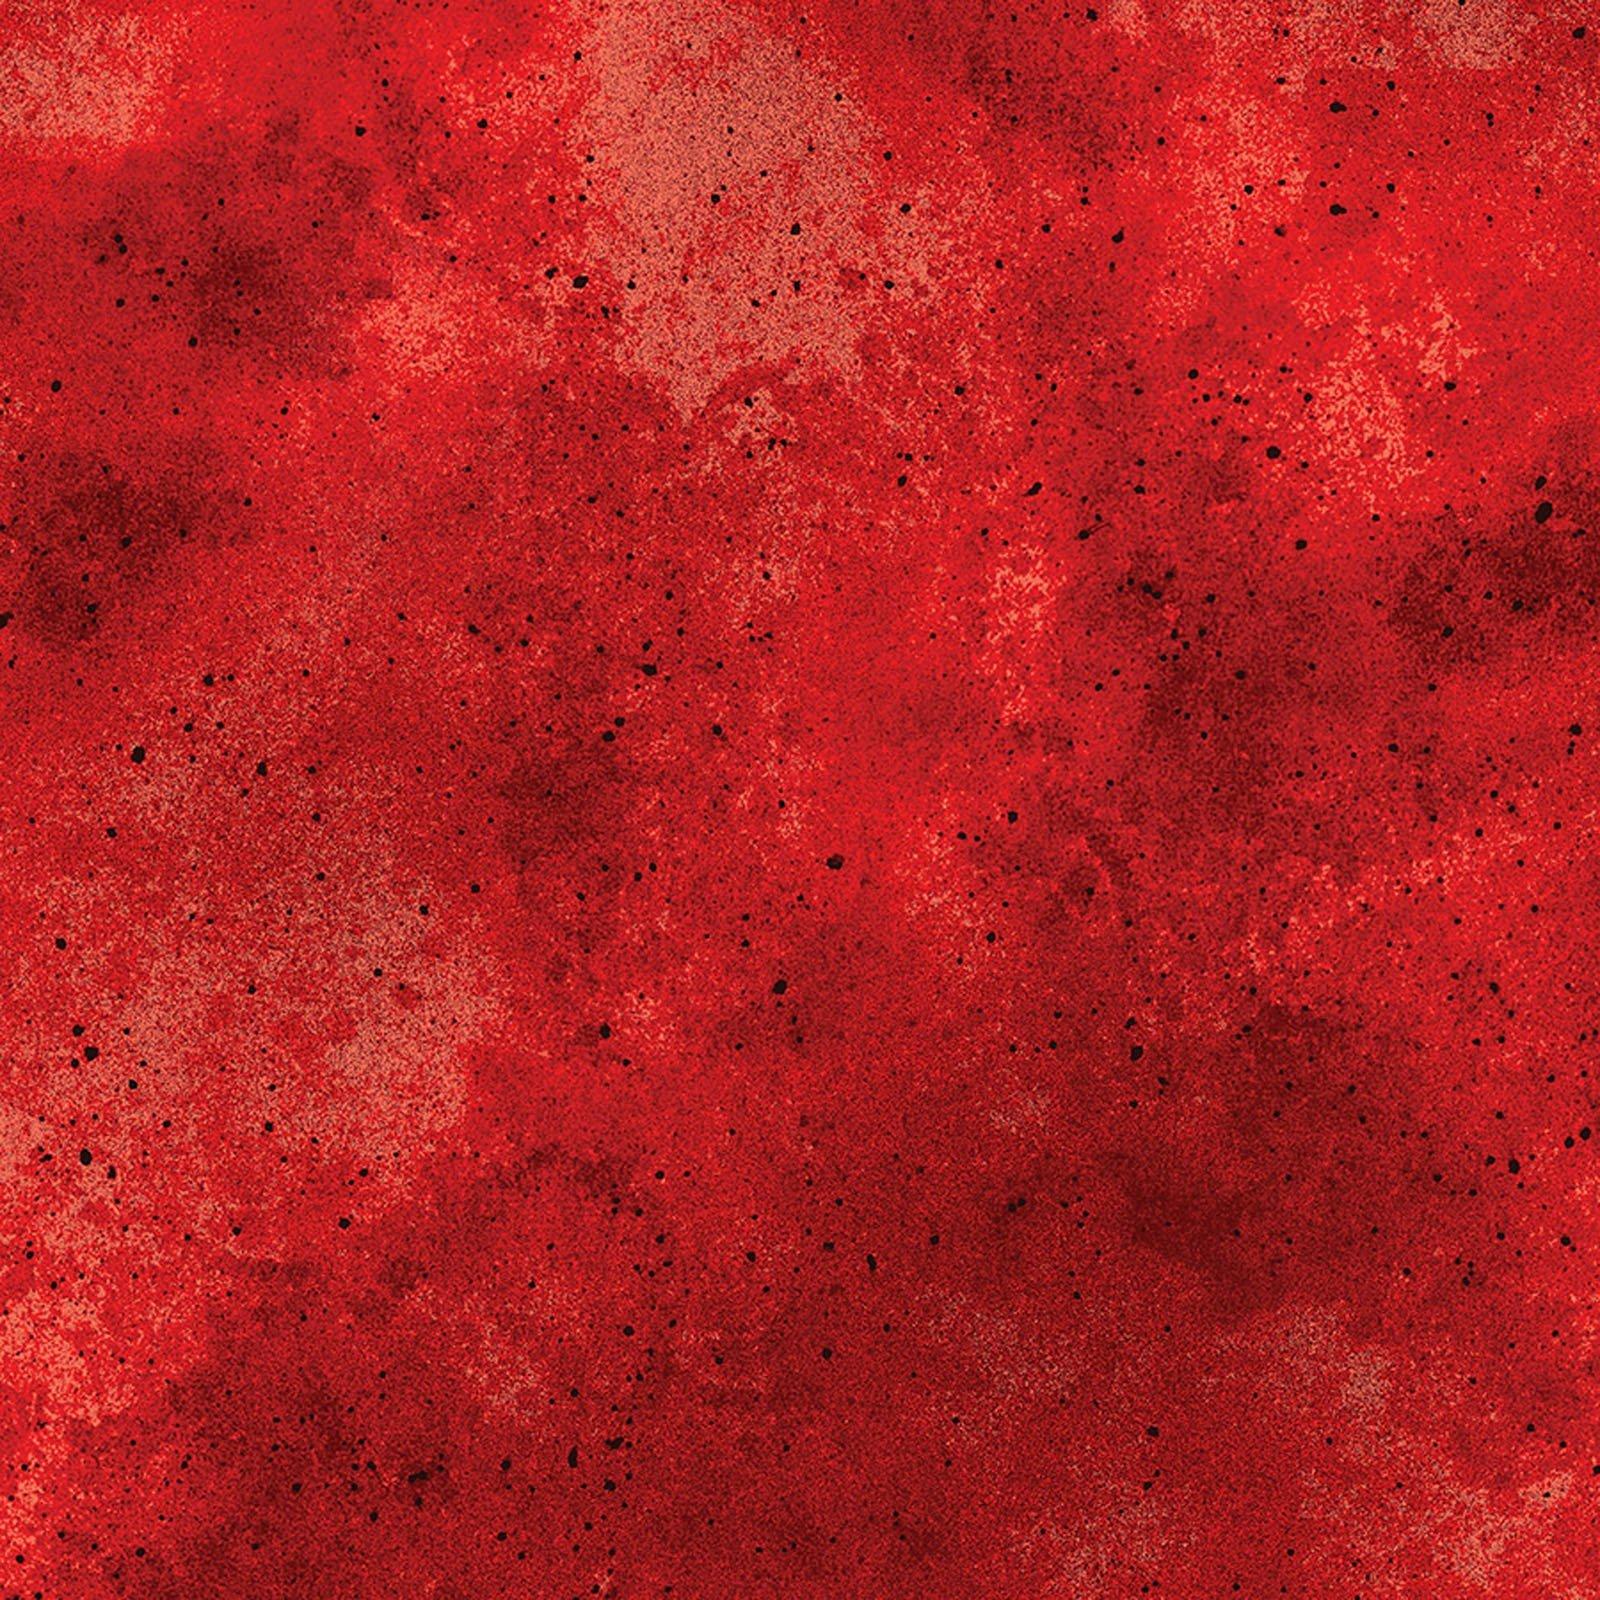 New Hue - Red/Gold FQ<br/>Kanvas Studio 8673M-10